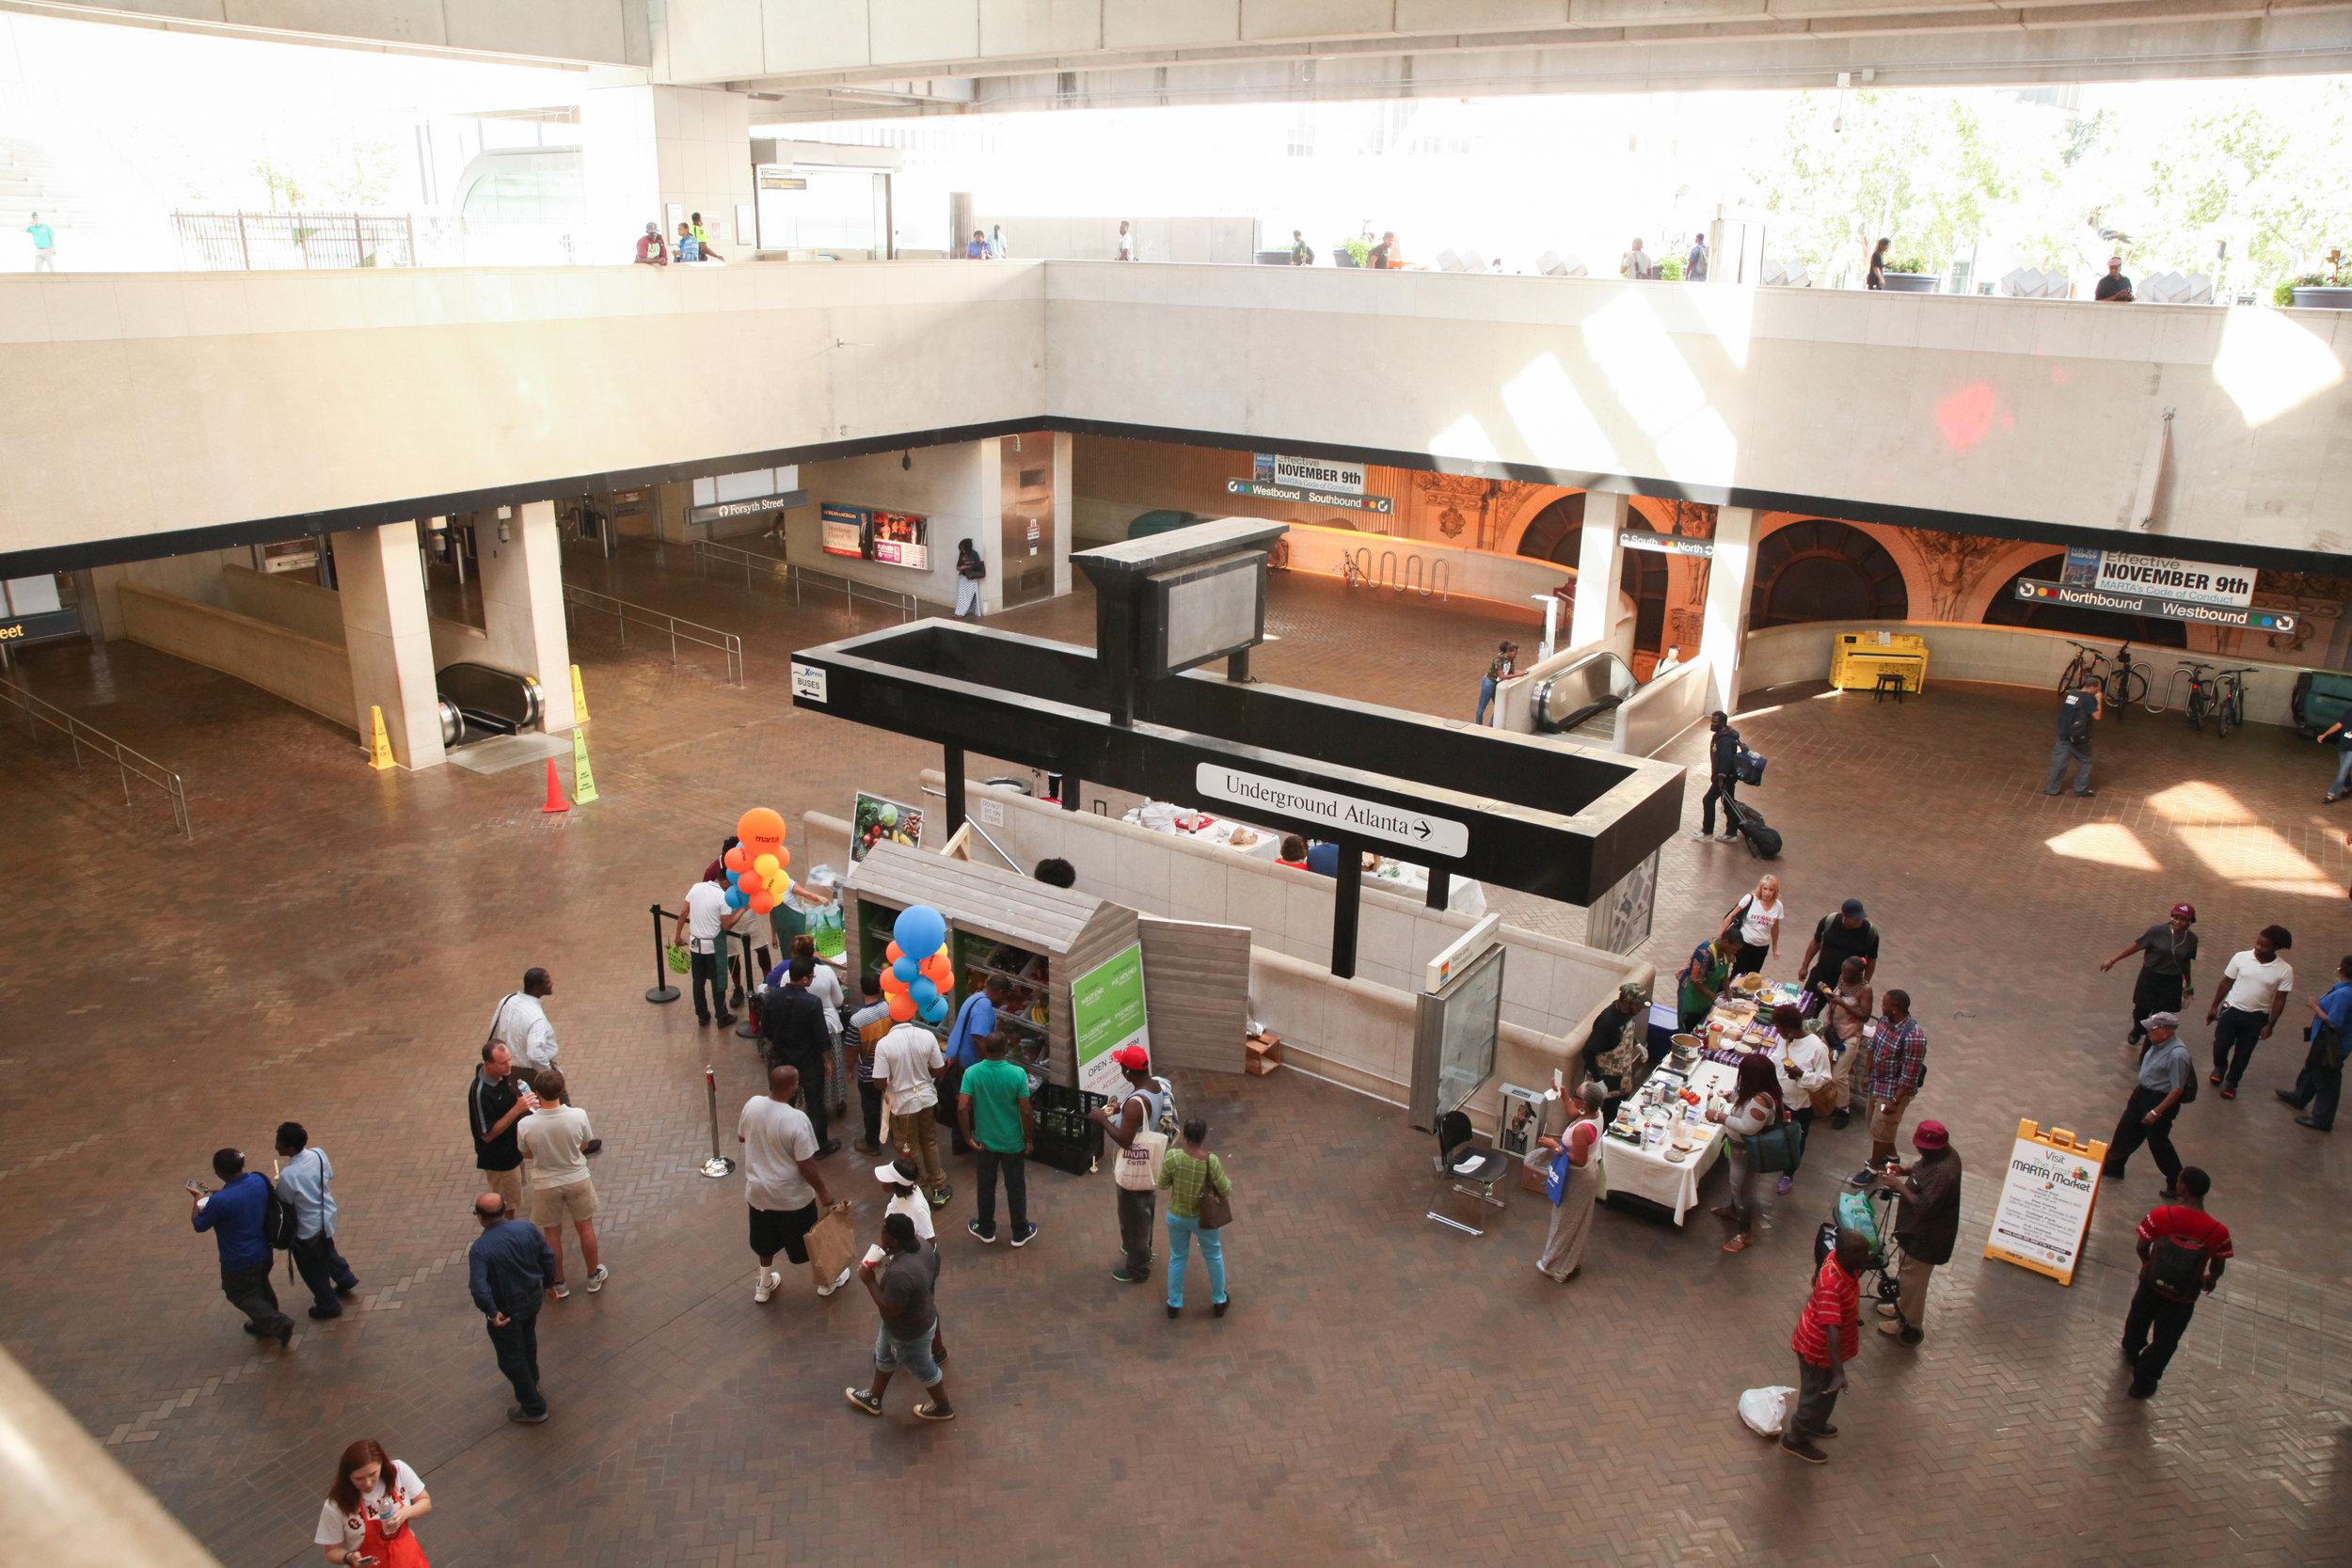 Patrons visit a Fresh MARTA Market stand featuring fresh produce inside a MARTA station